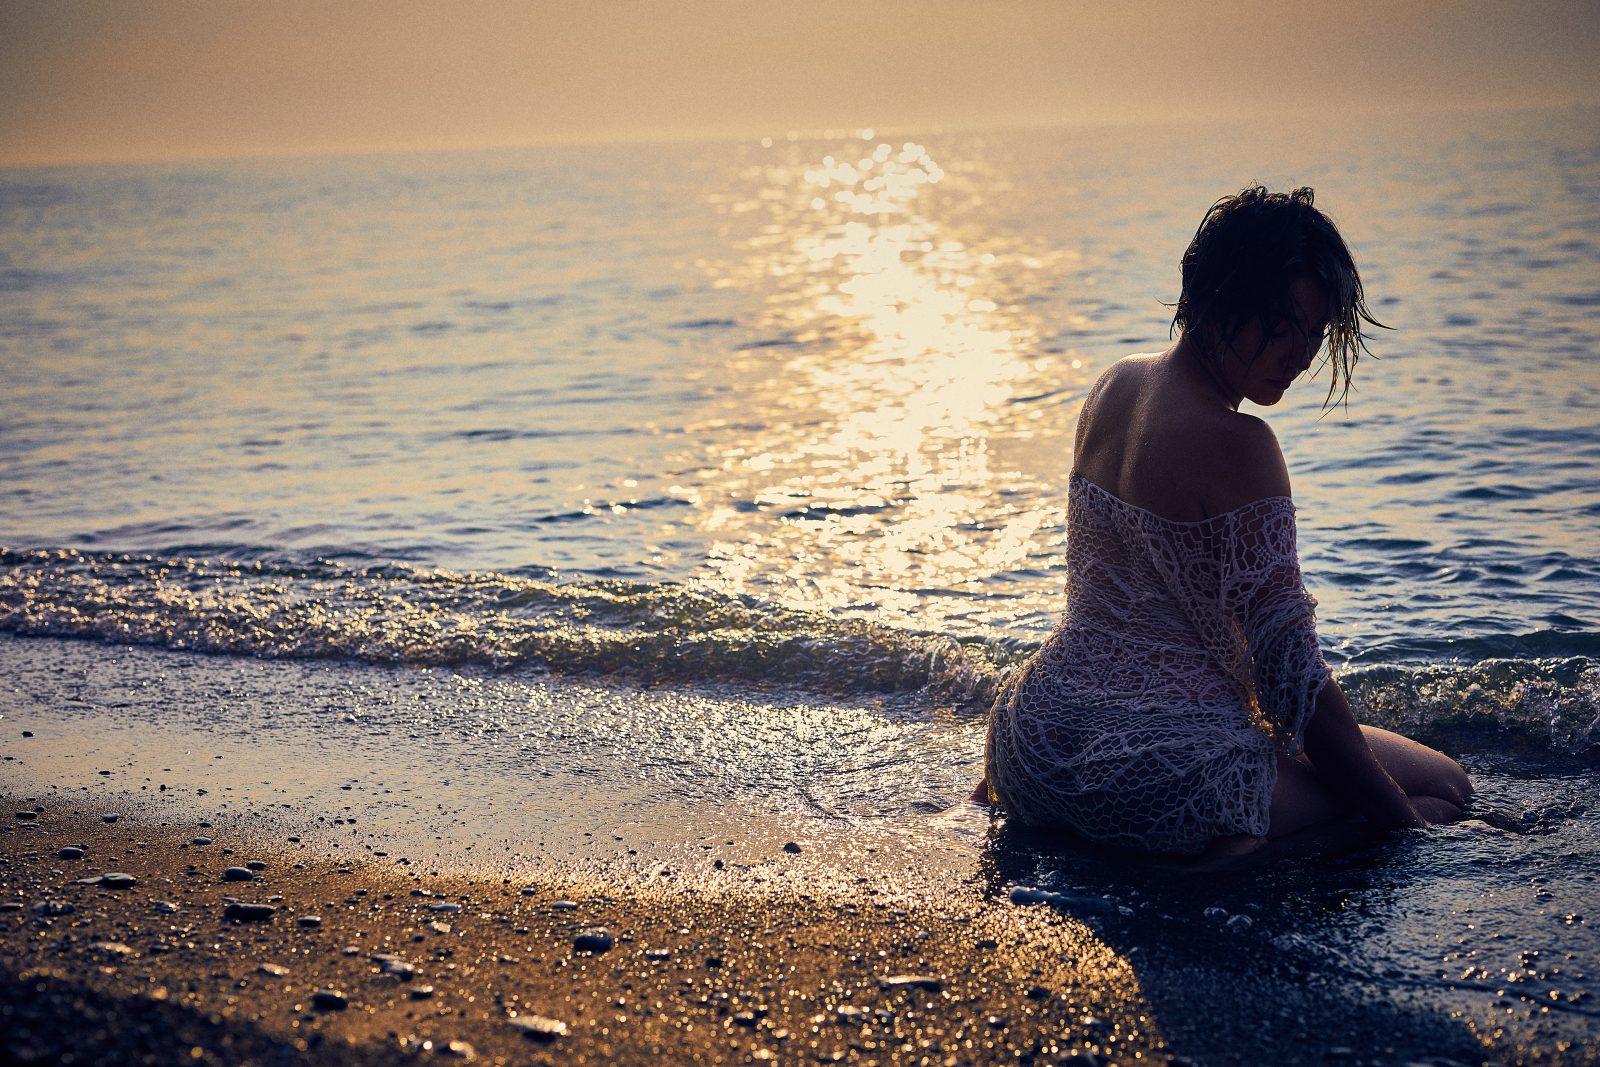 boudoir goddess woman at beach grounding self-care